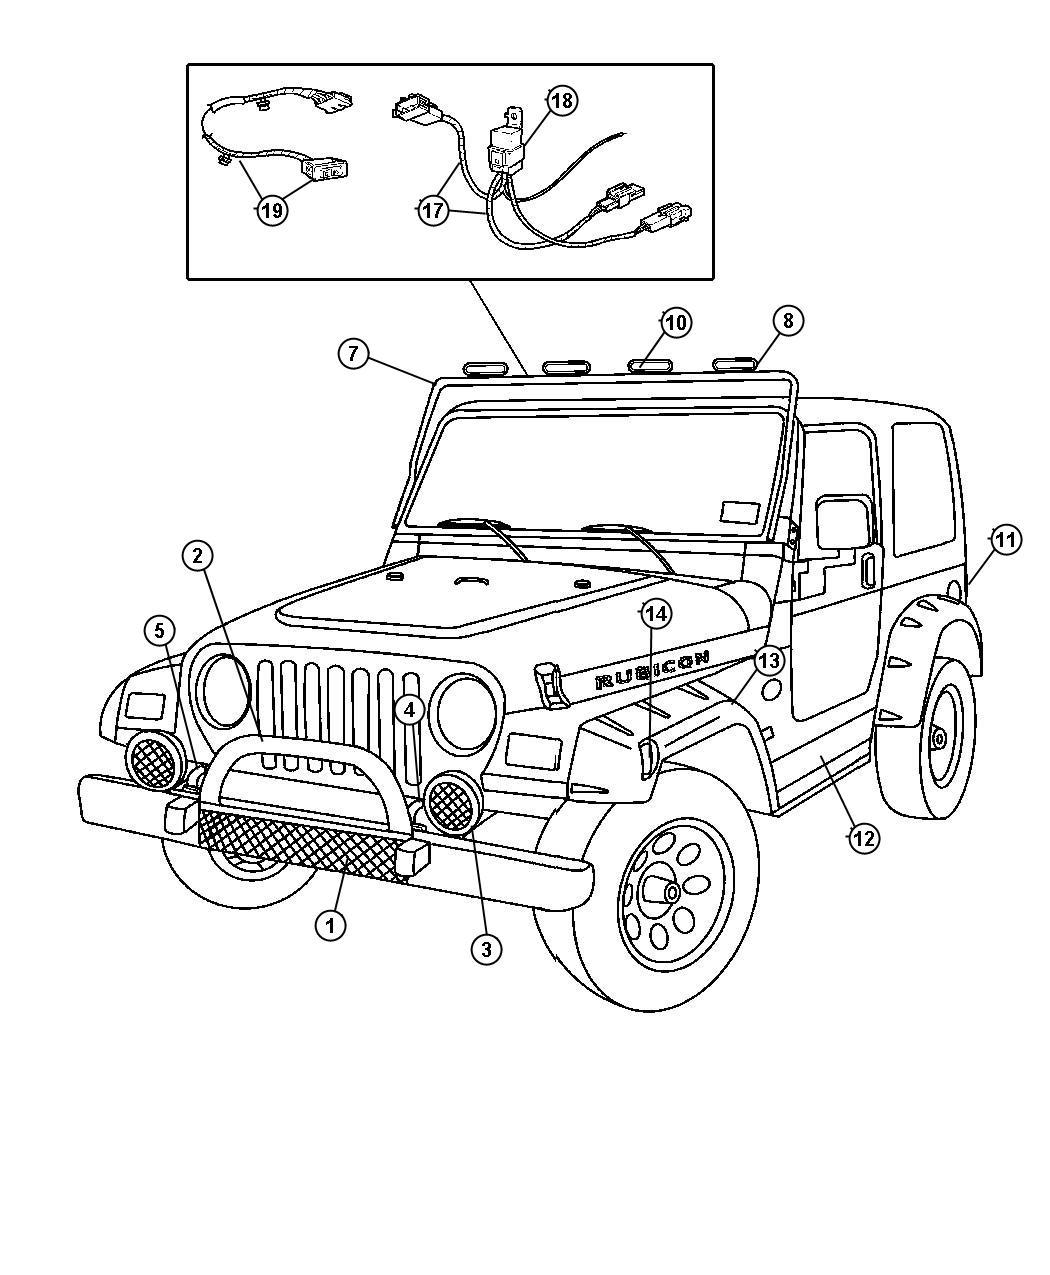 2003 Jeep Wrangler SPORT 4.0L Power Tech I-6, 4-Spd